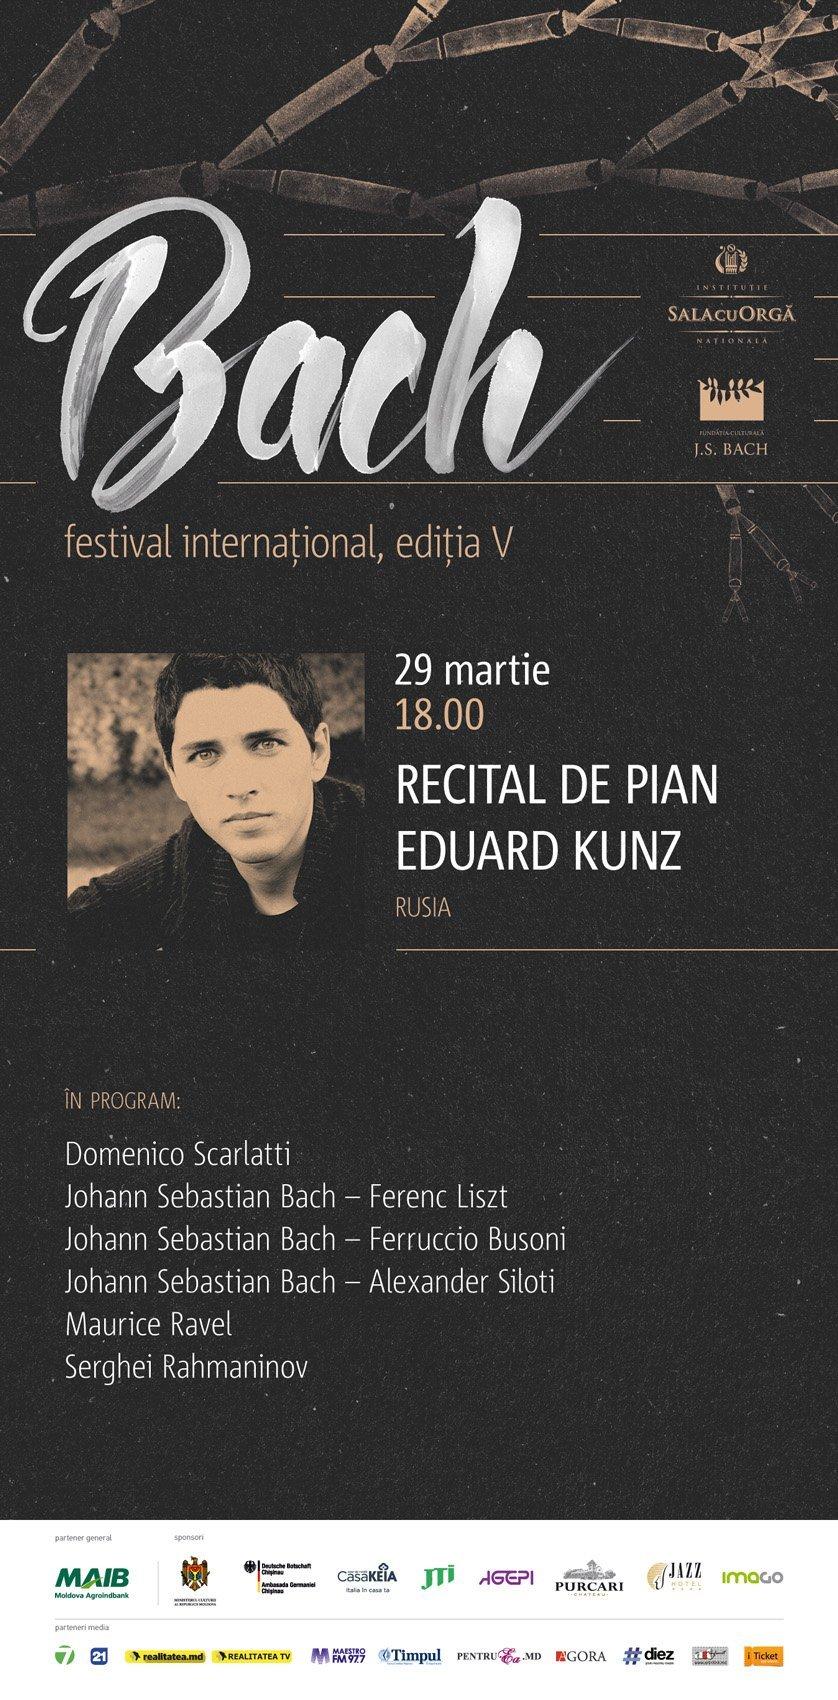 EDUARD KUNZ recital de pian